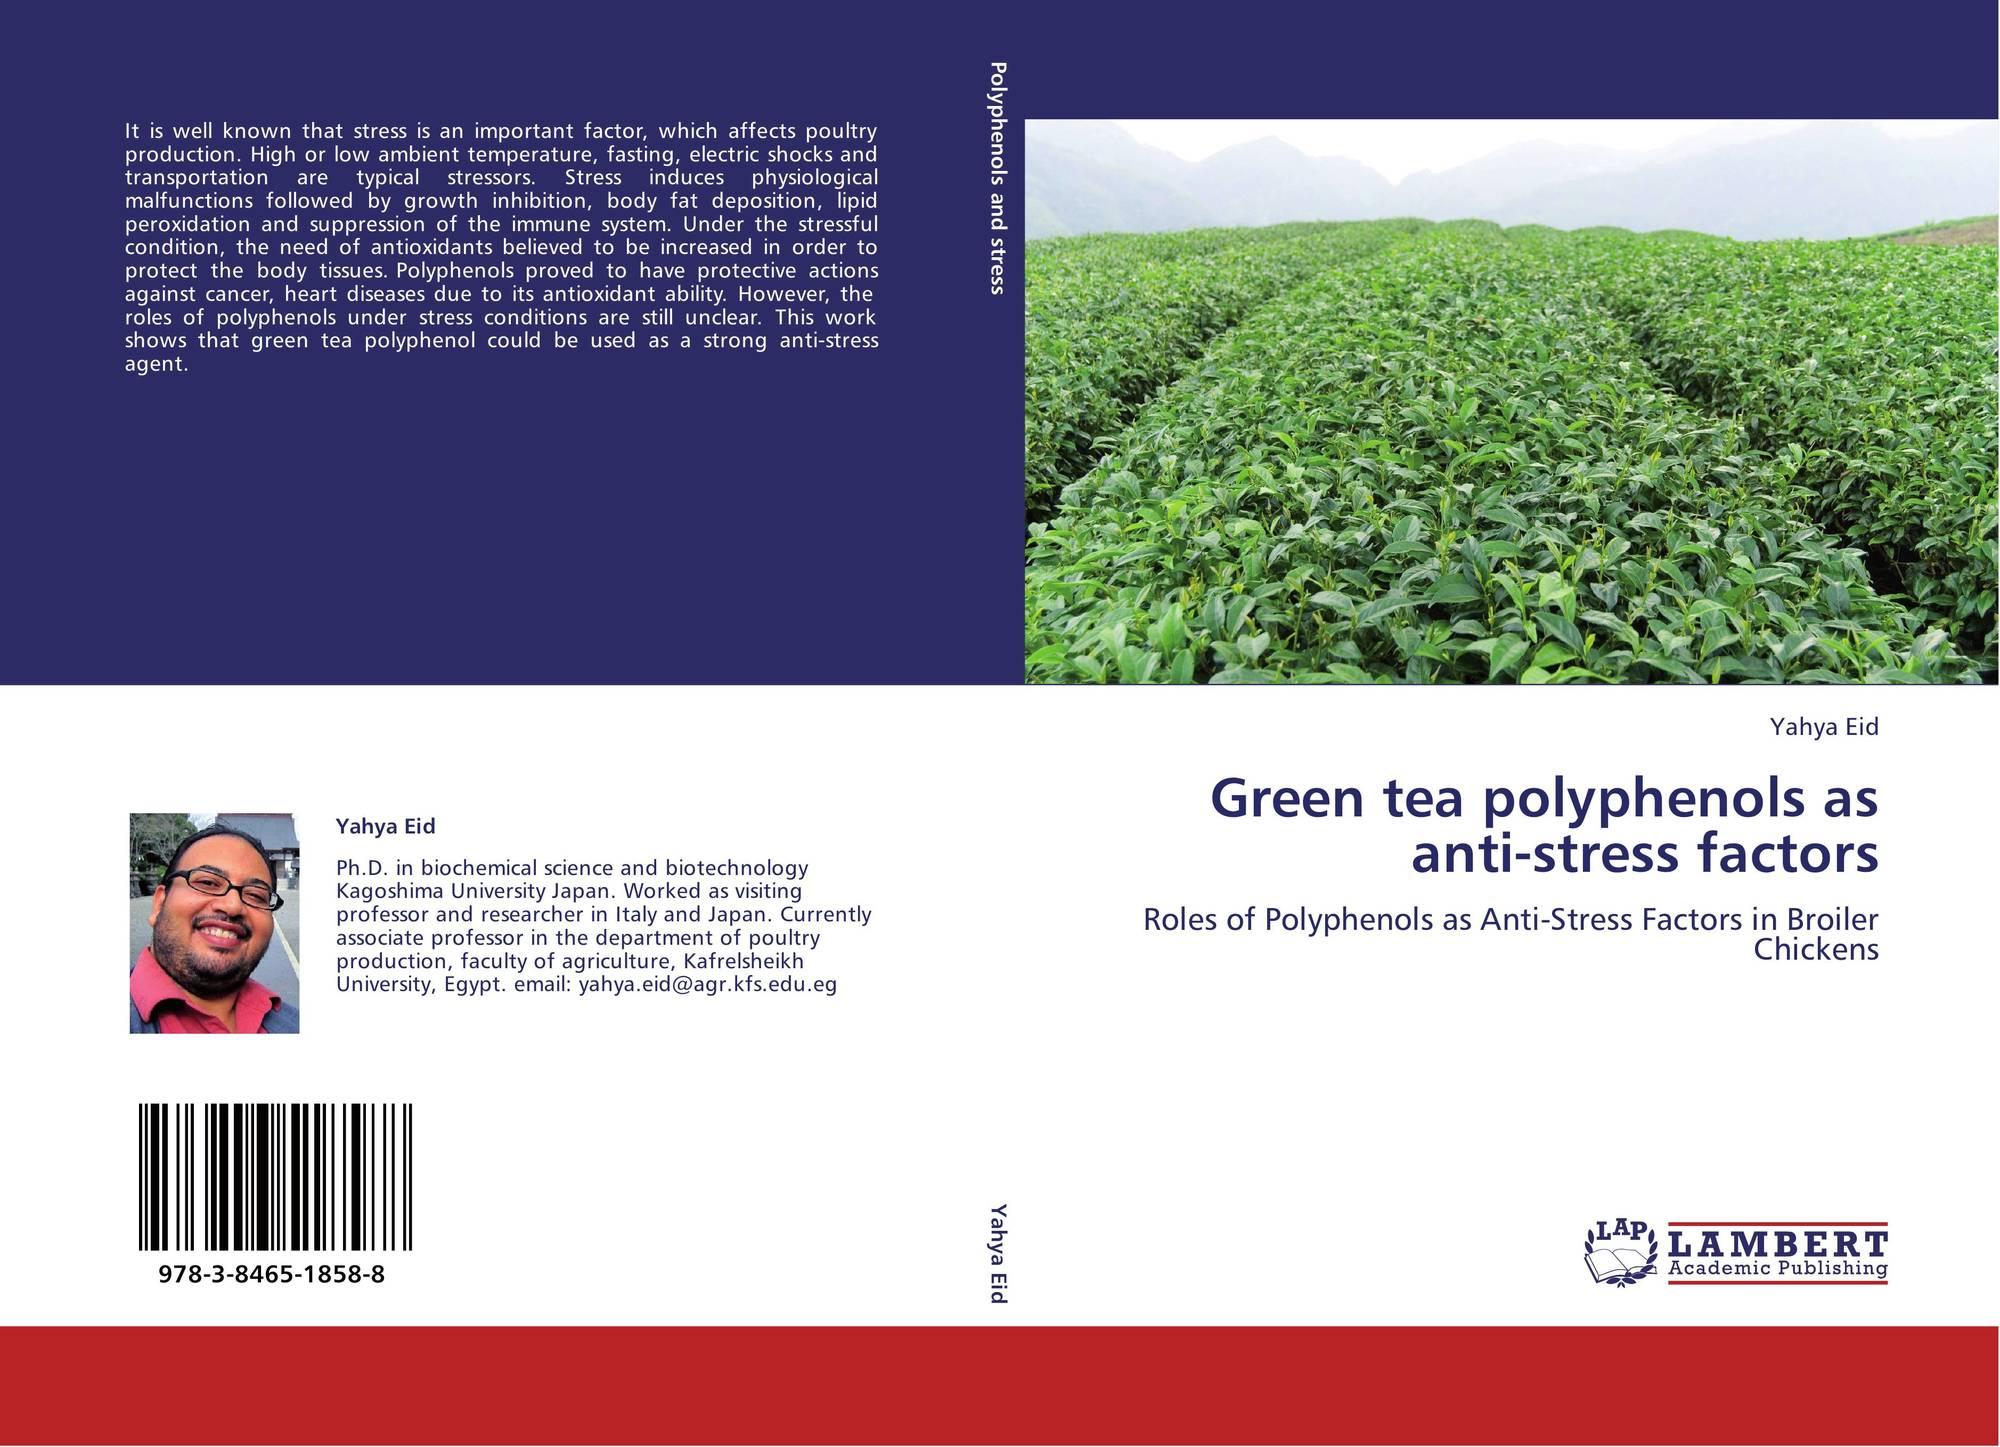 Green tea polyphenols as anti-stress factors, 978-3-8465